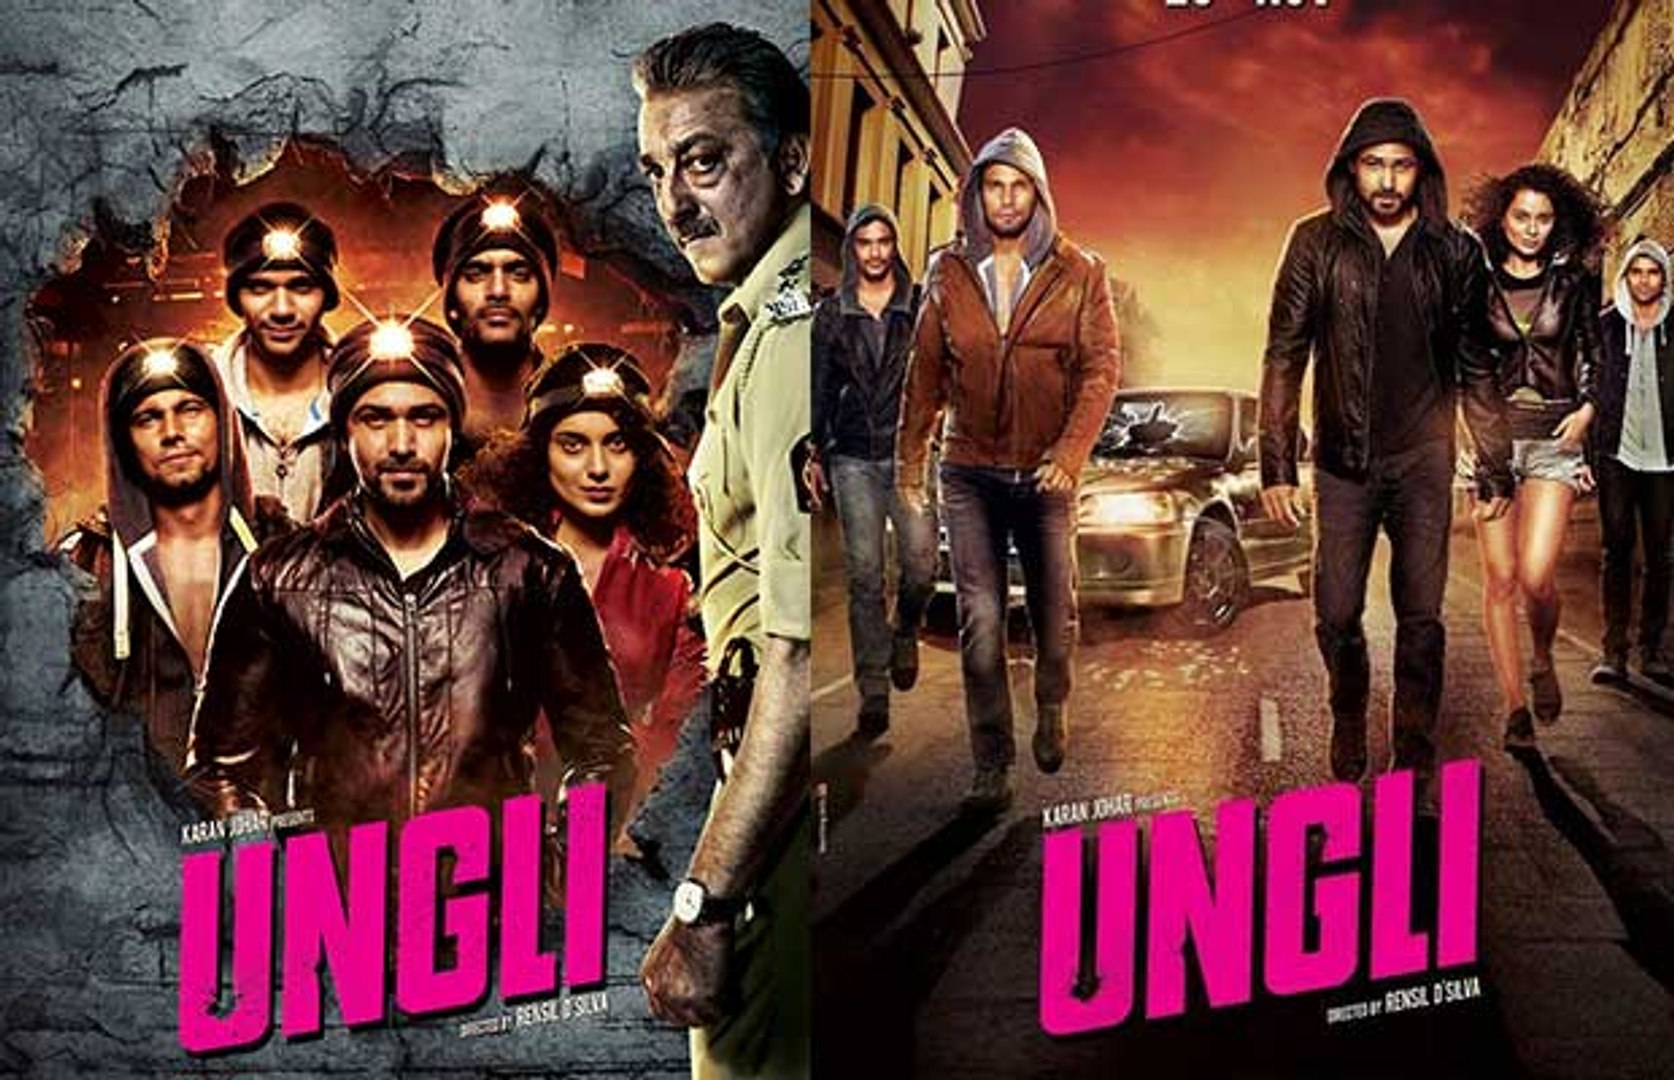 Ungli Bollywood Movie Trailer Emraan Hashmi Kangana Ranaut Randeep Hooda  Sanjay Dutt - video dailymotion